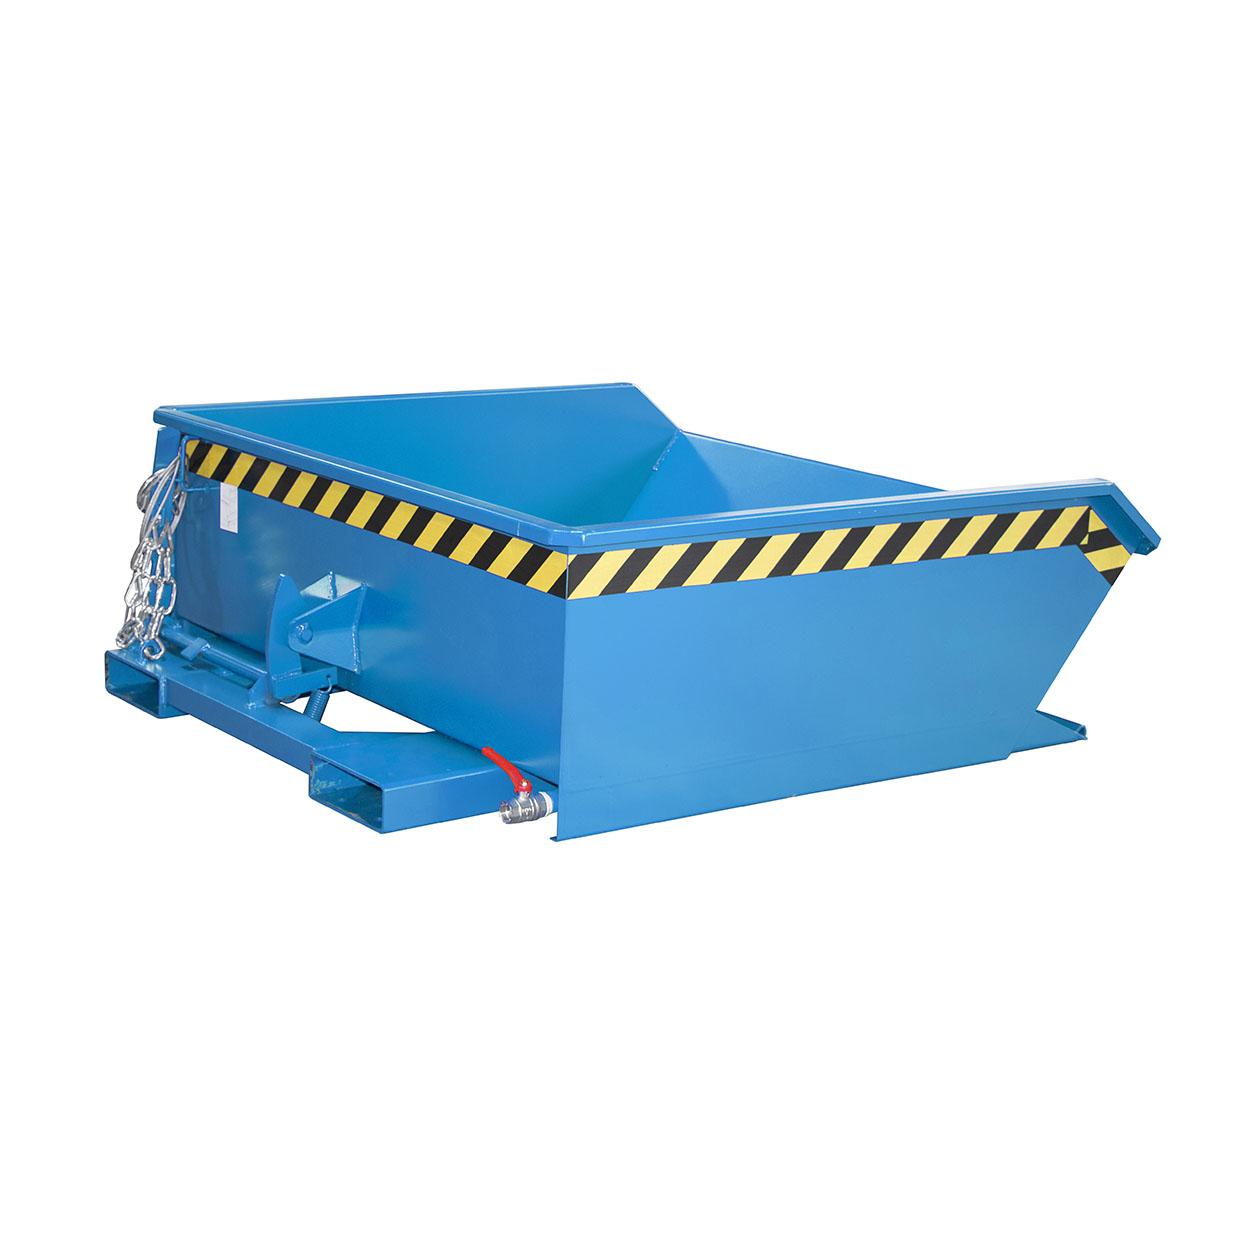 Výklopný kontejner MINI s výpustí